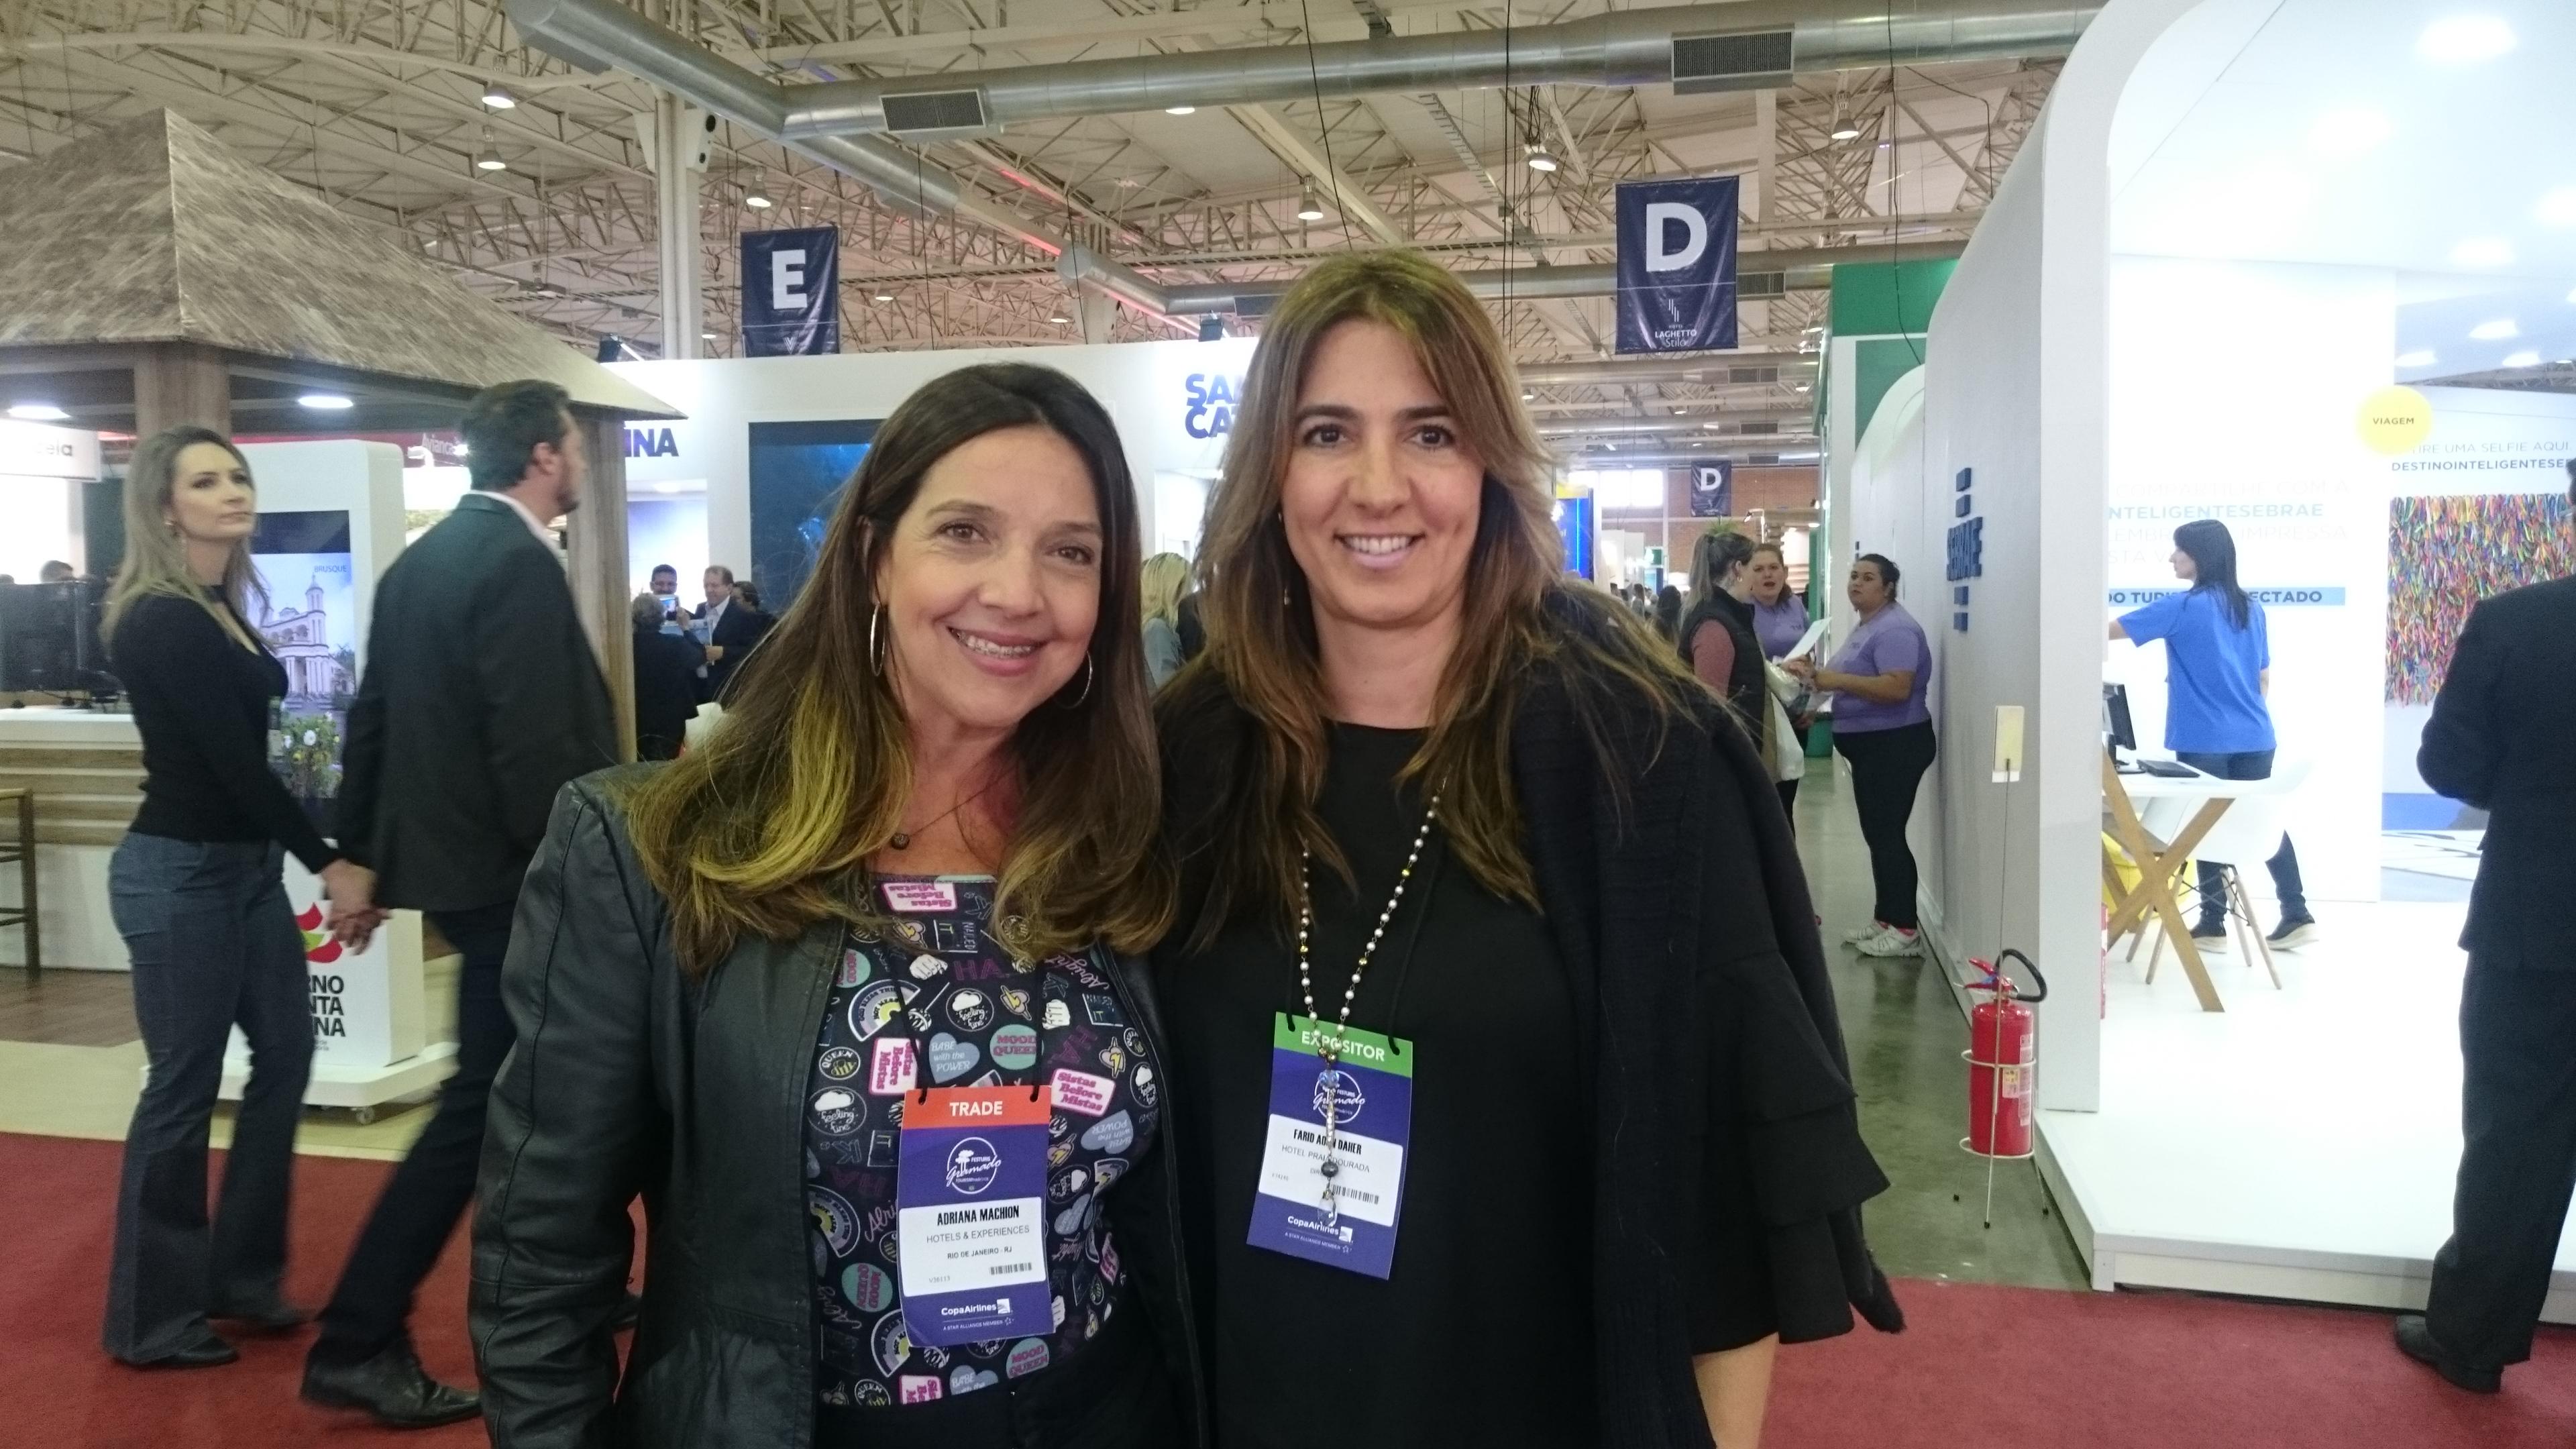 Gisele Torrano, da Eagles Team, e Adriana Machion, da Hotel Experience (1)